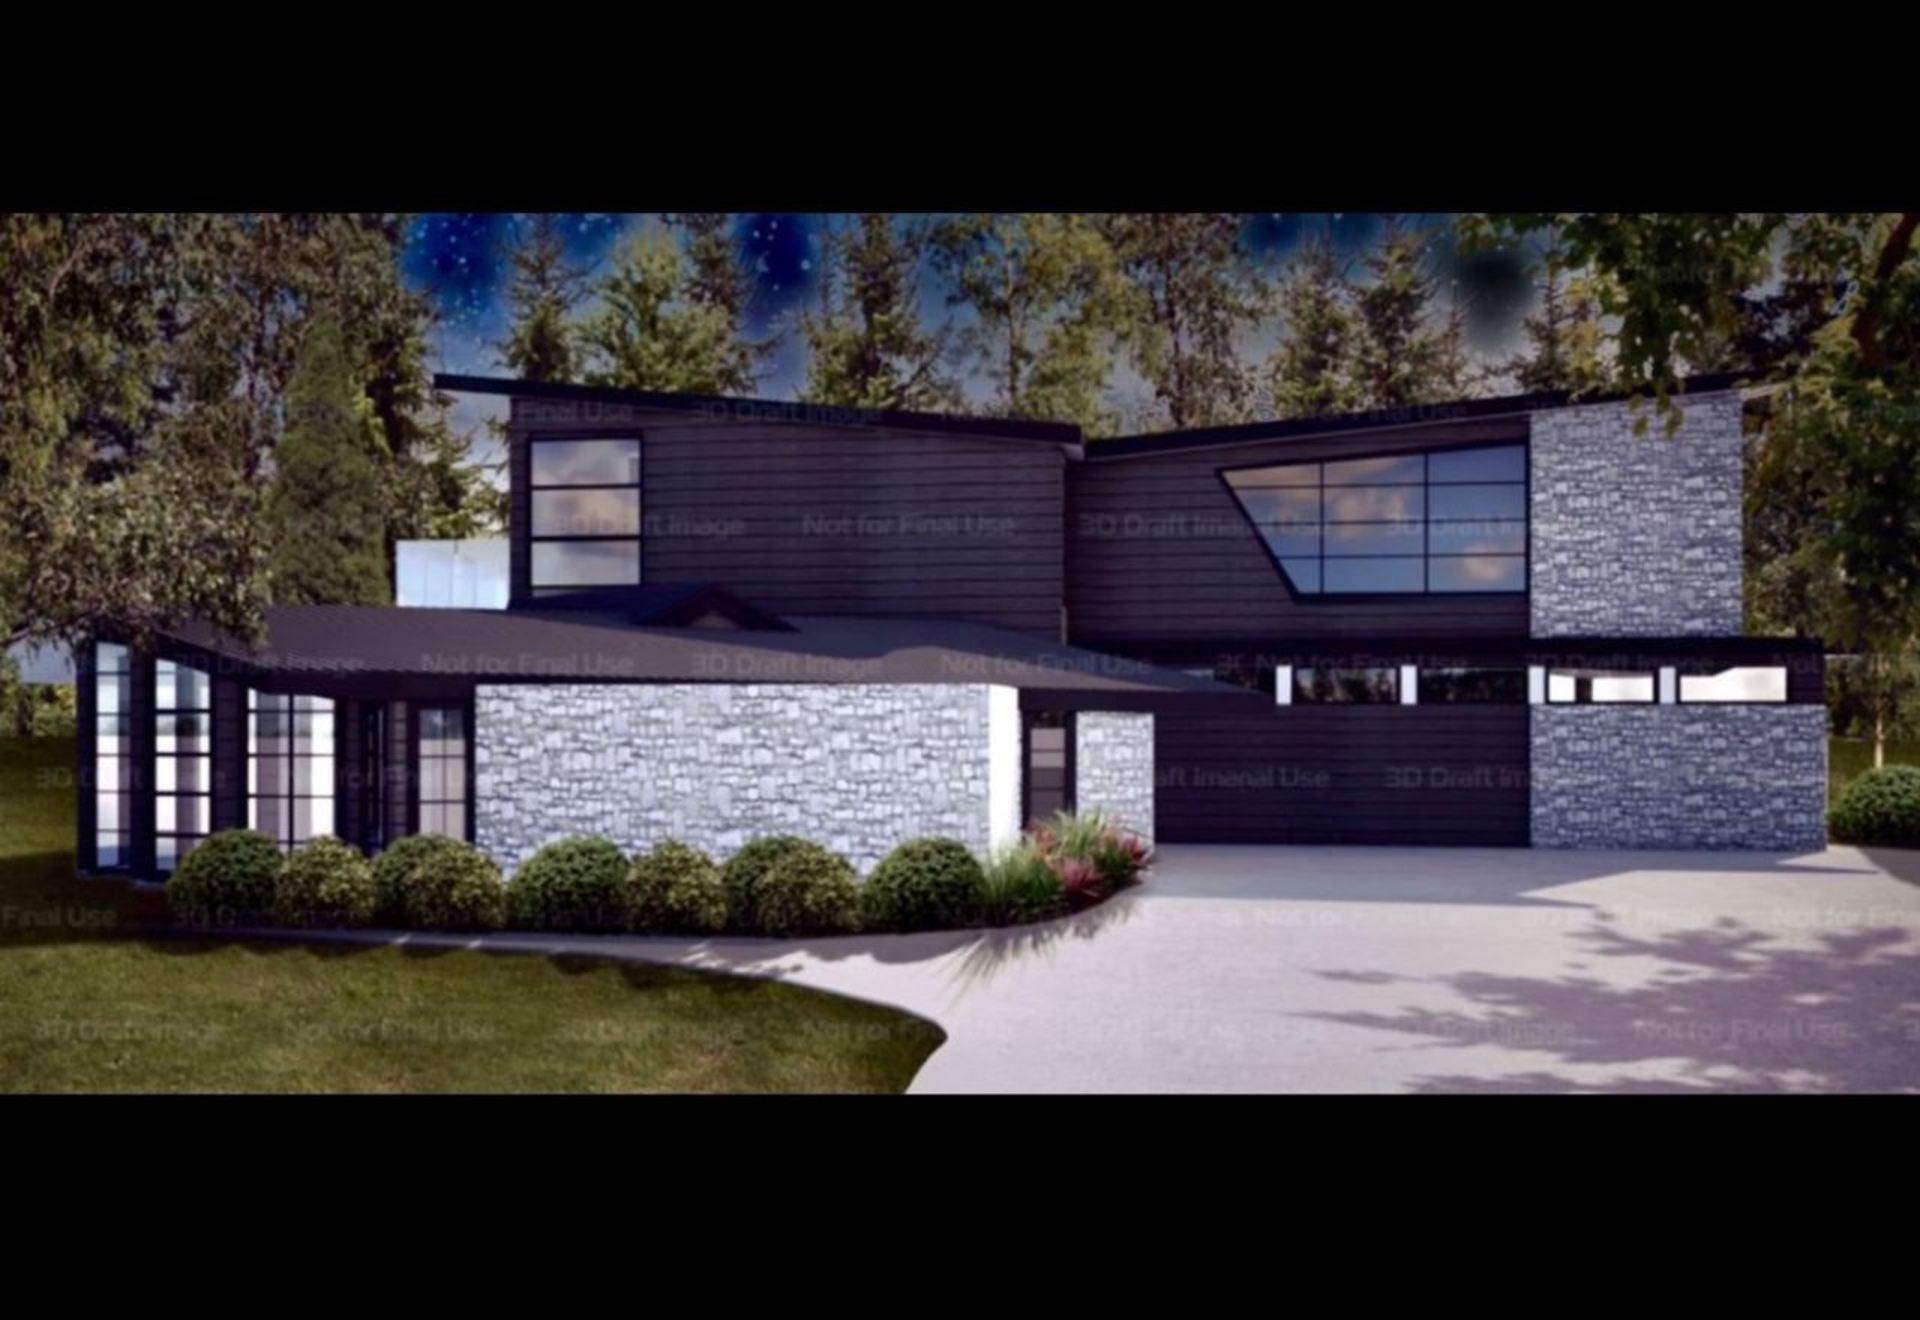 1160-ridgewood-drive-edgemont-north-vancouver-01 at 1160 Ridgewood Drive, Edgemont, North Vancouver